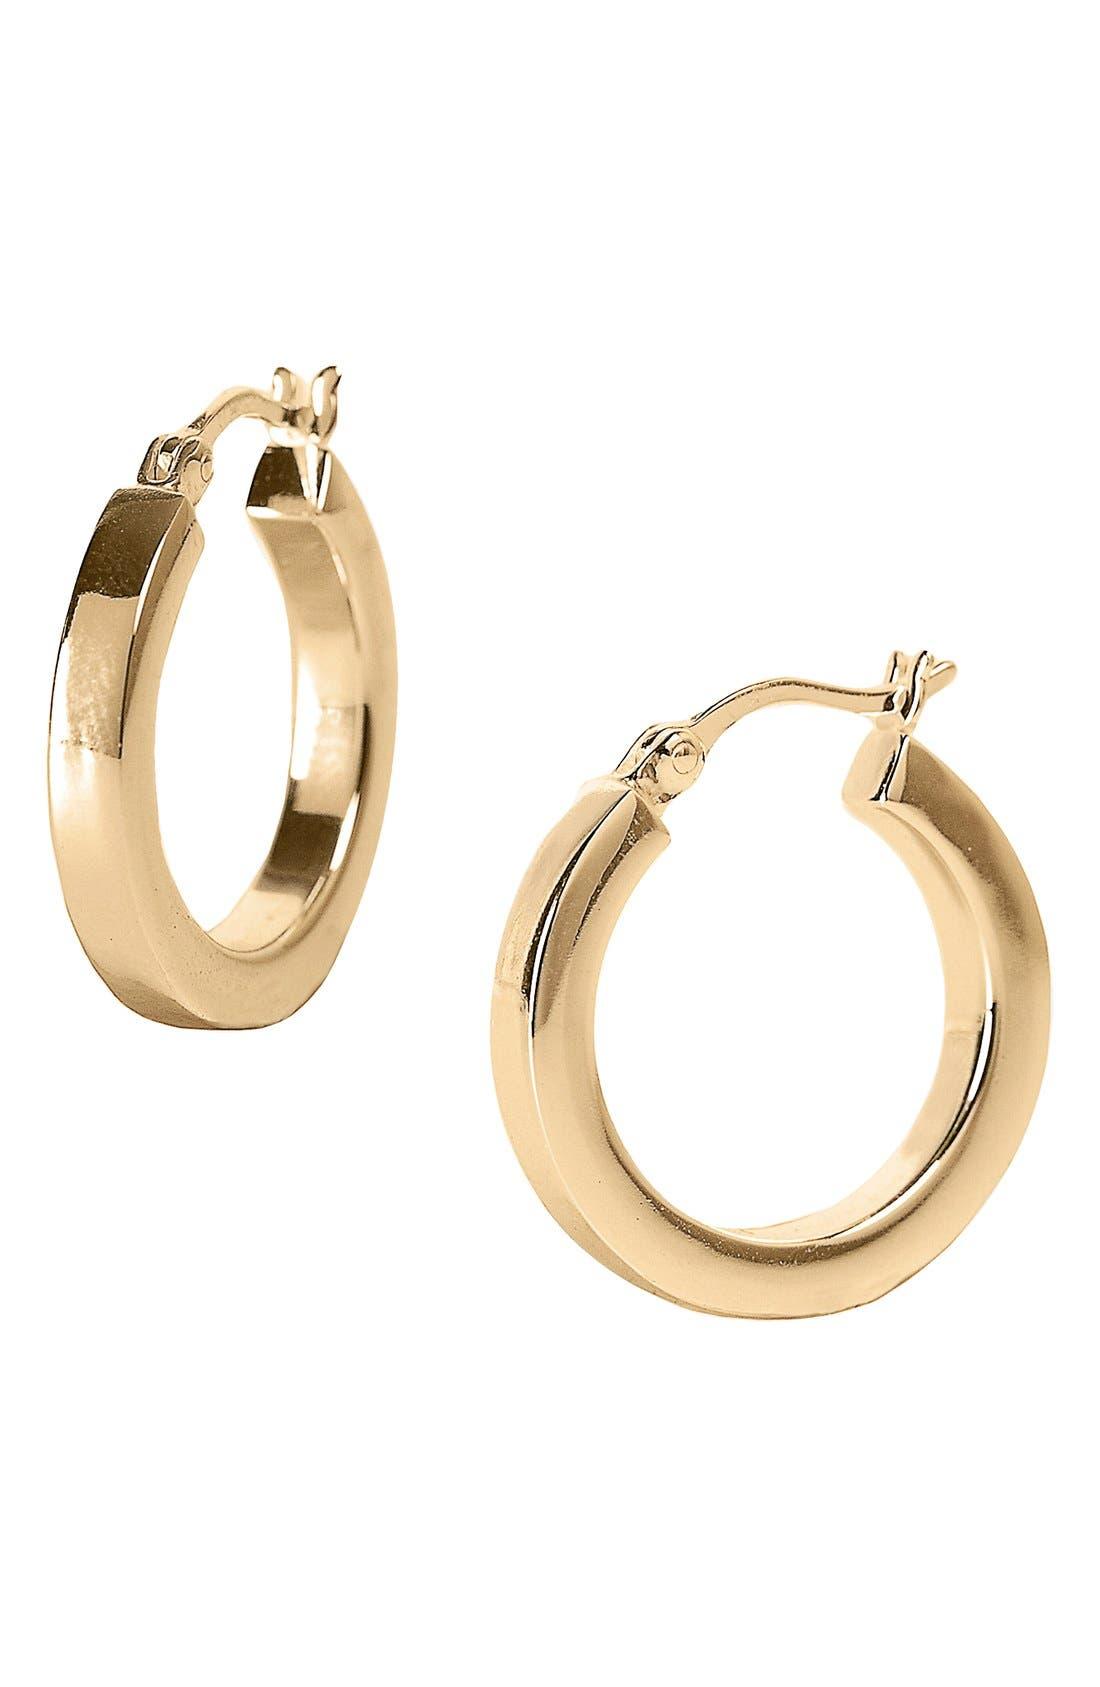 Alternate Image 1 Selected - Argento Vivo Small Hoop Earrings (Nordstrom Exclusive)